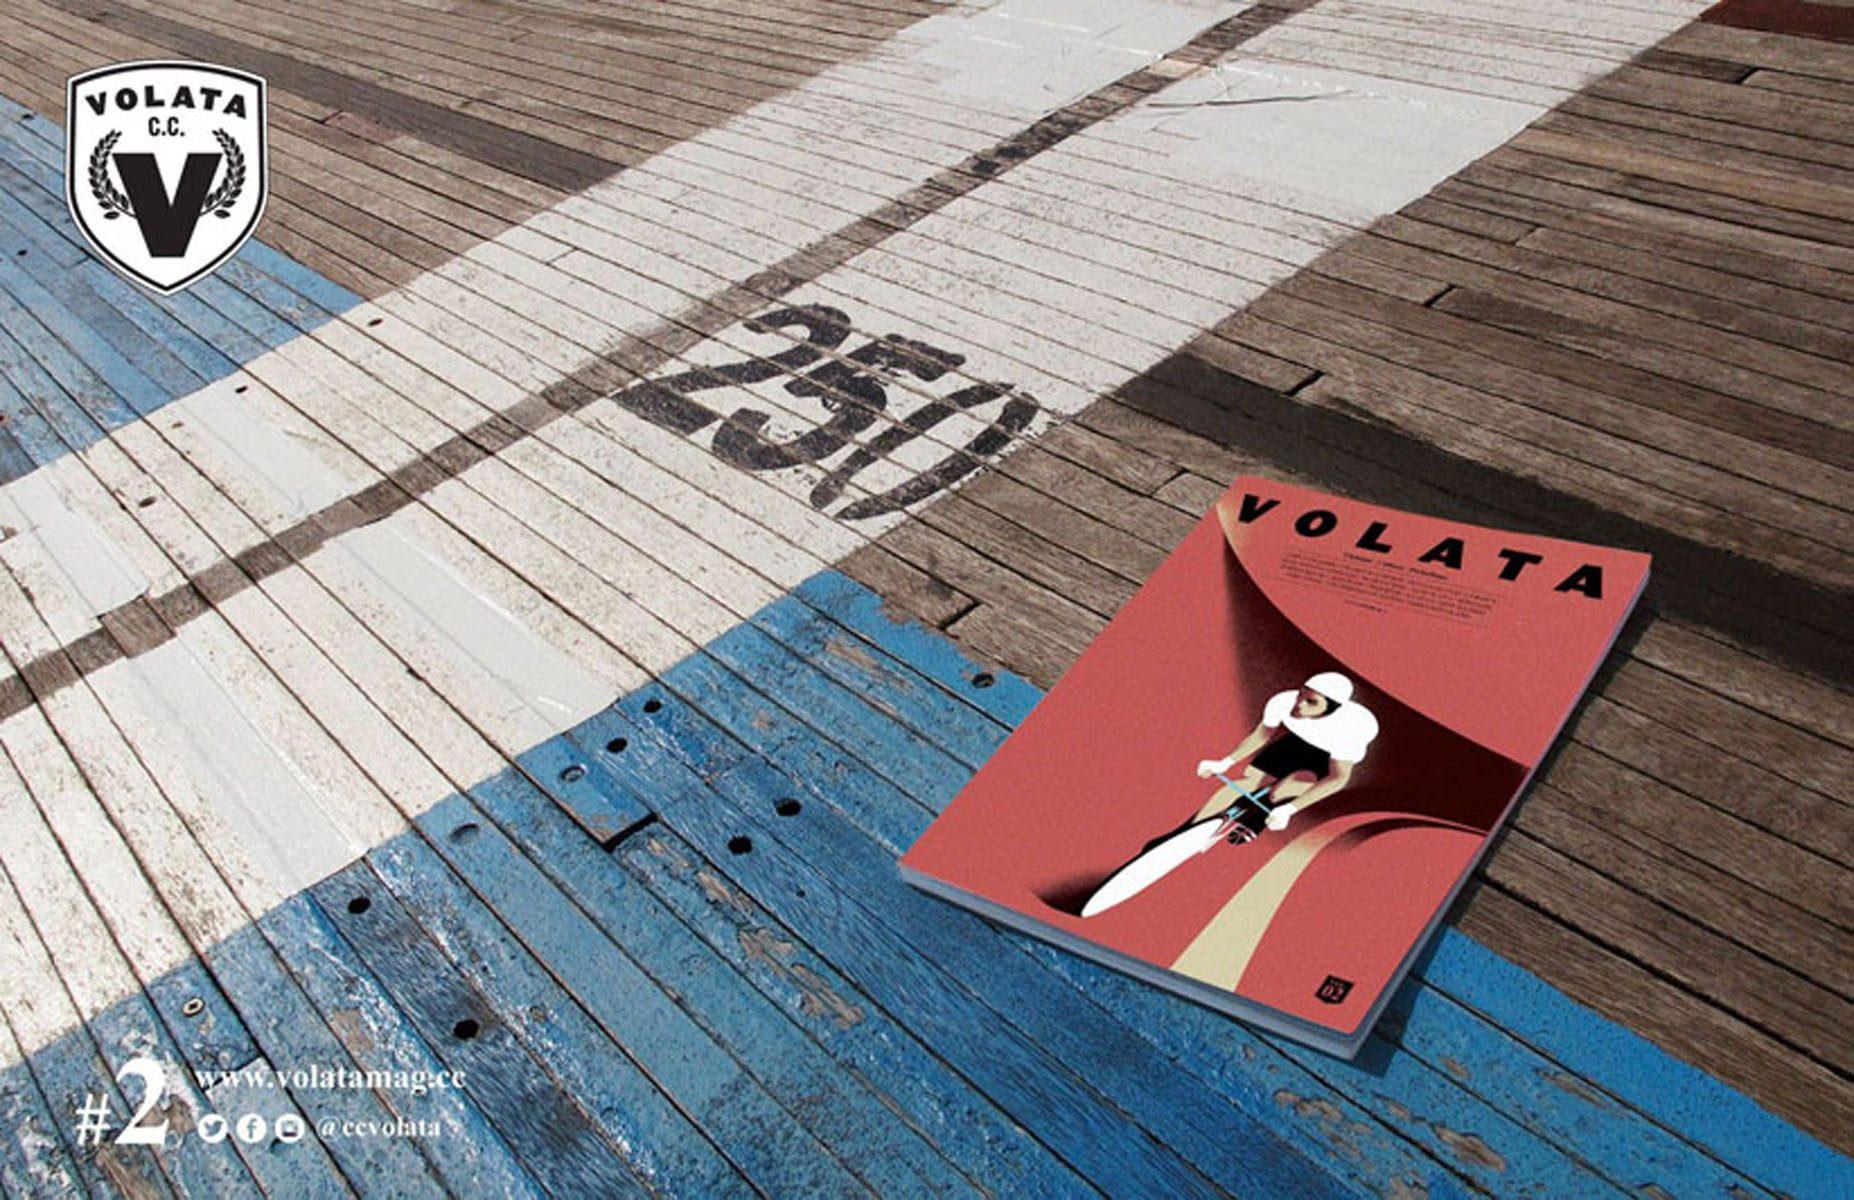 Volata magazine  Jordi Rins